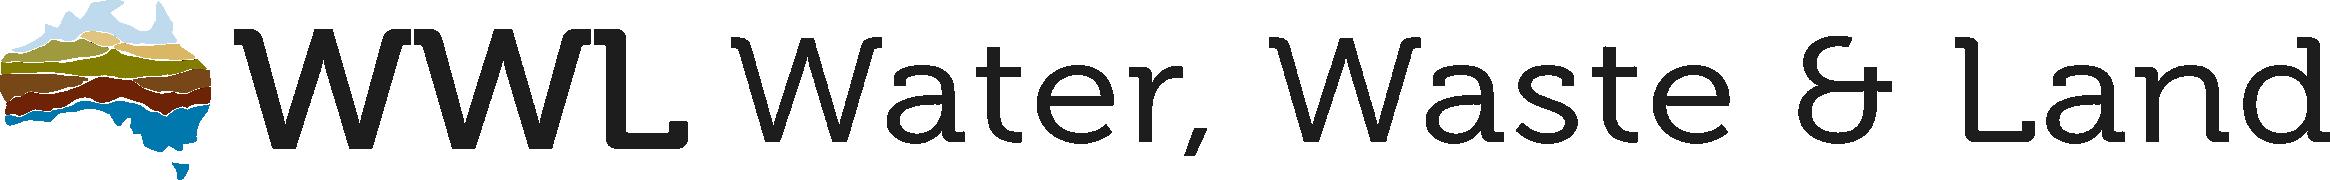 logo-wwl-sticky-v2-retina